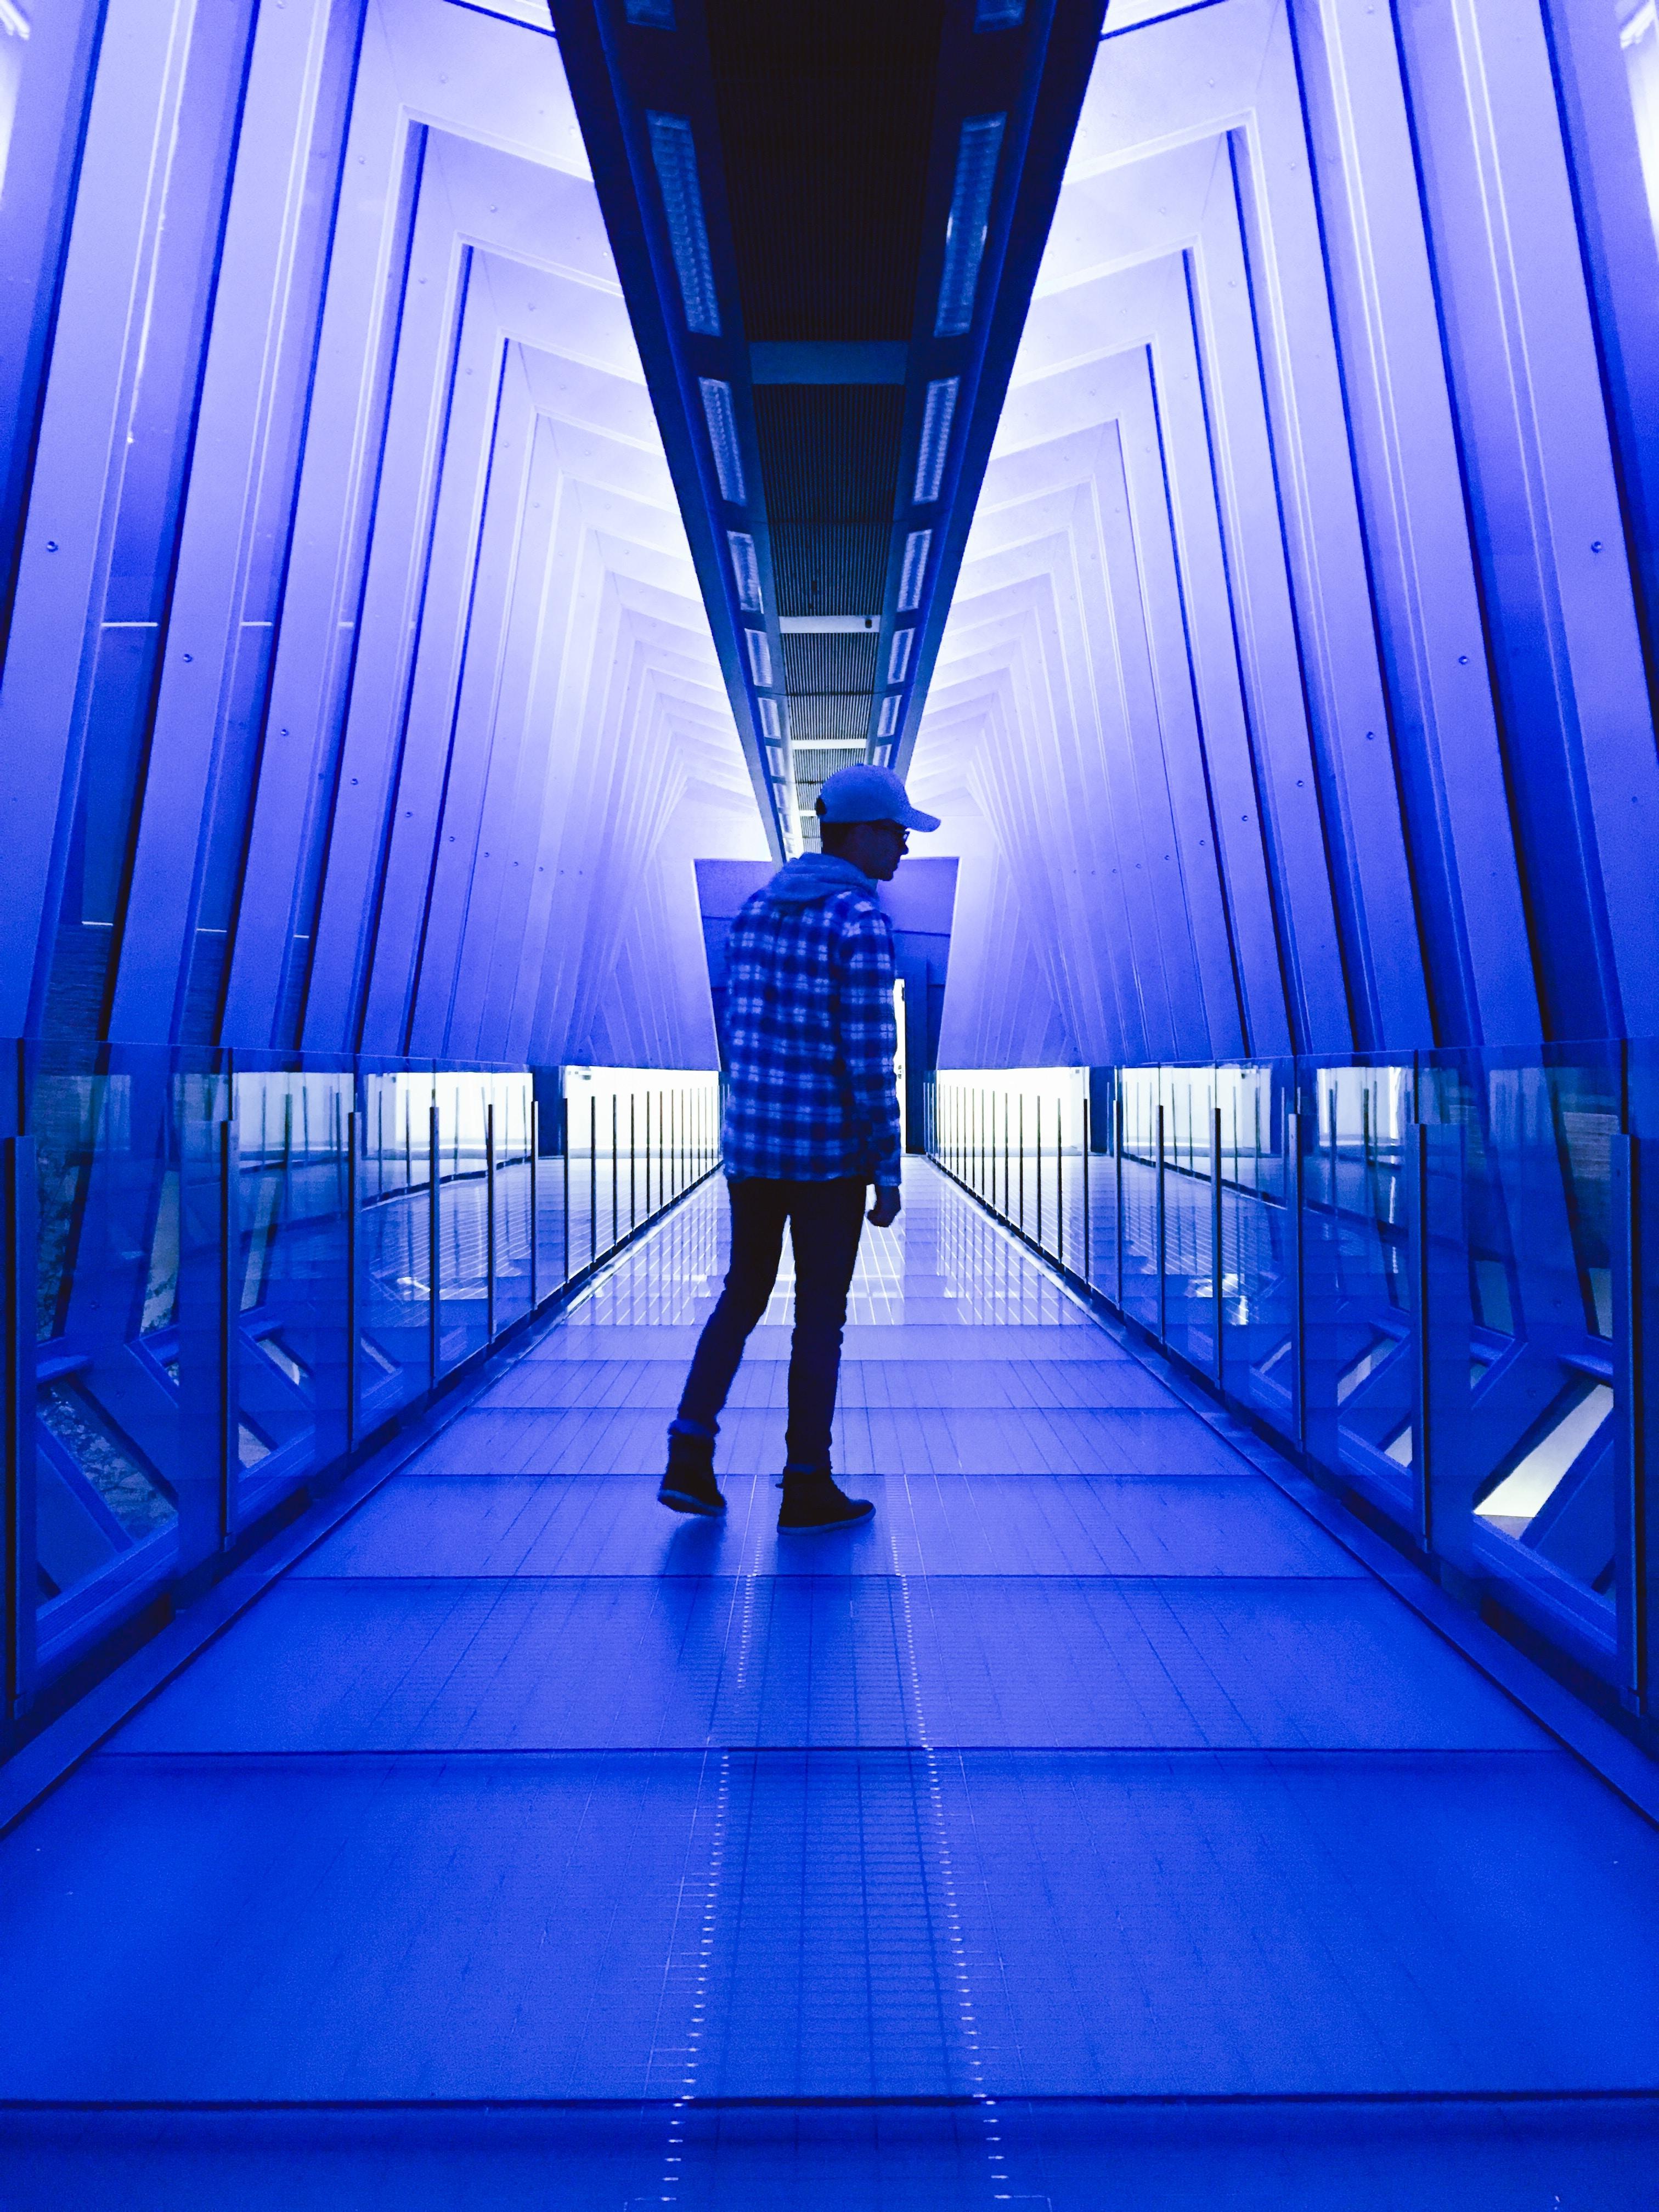 man standing between walls with blue lights